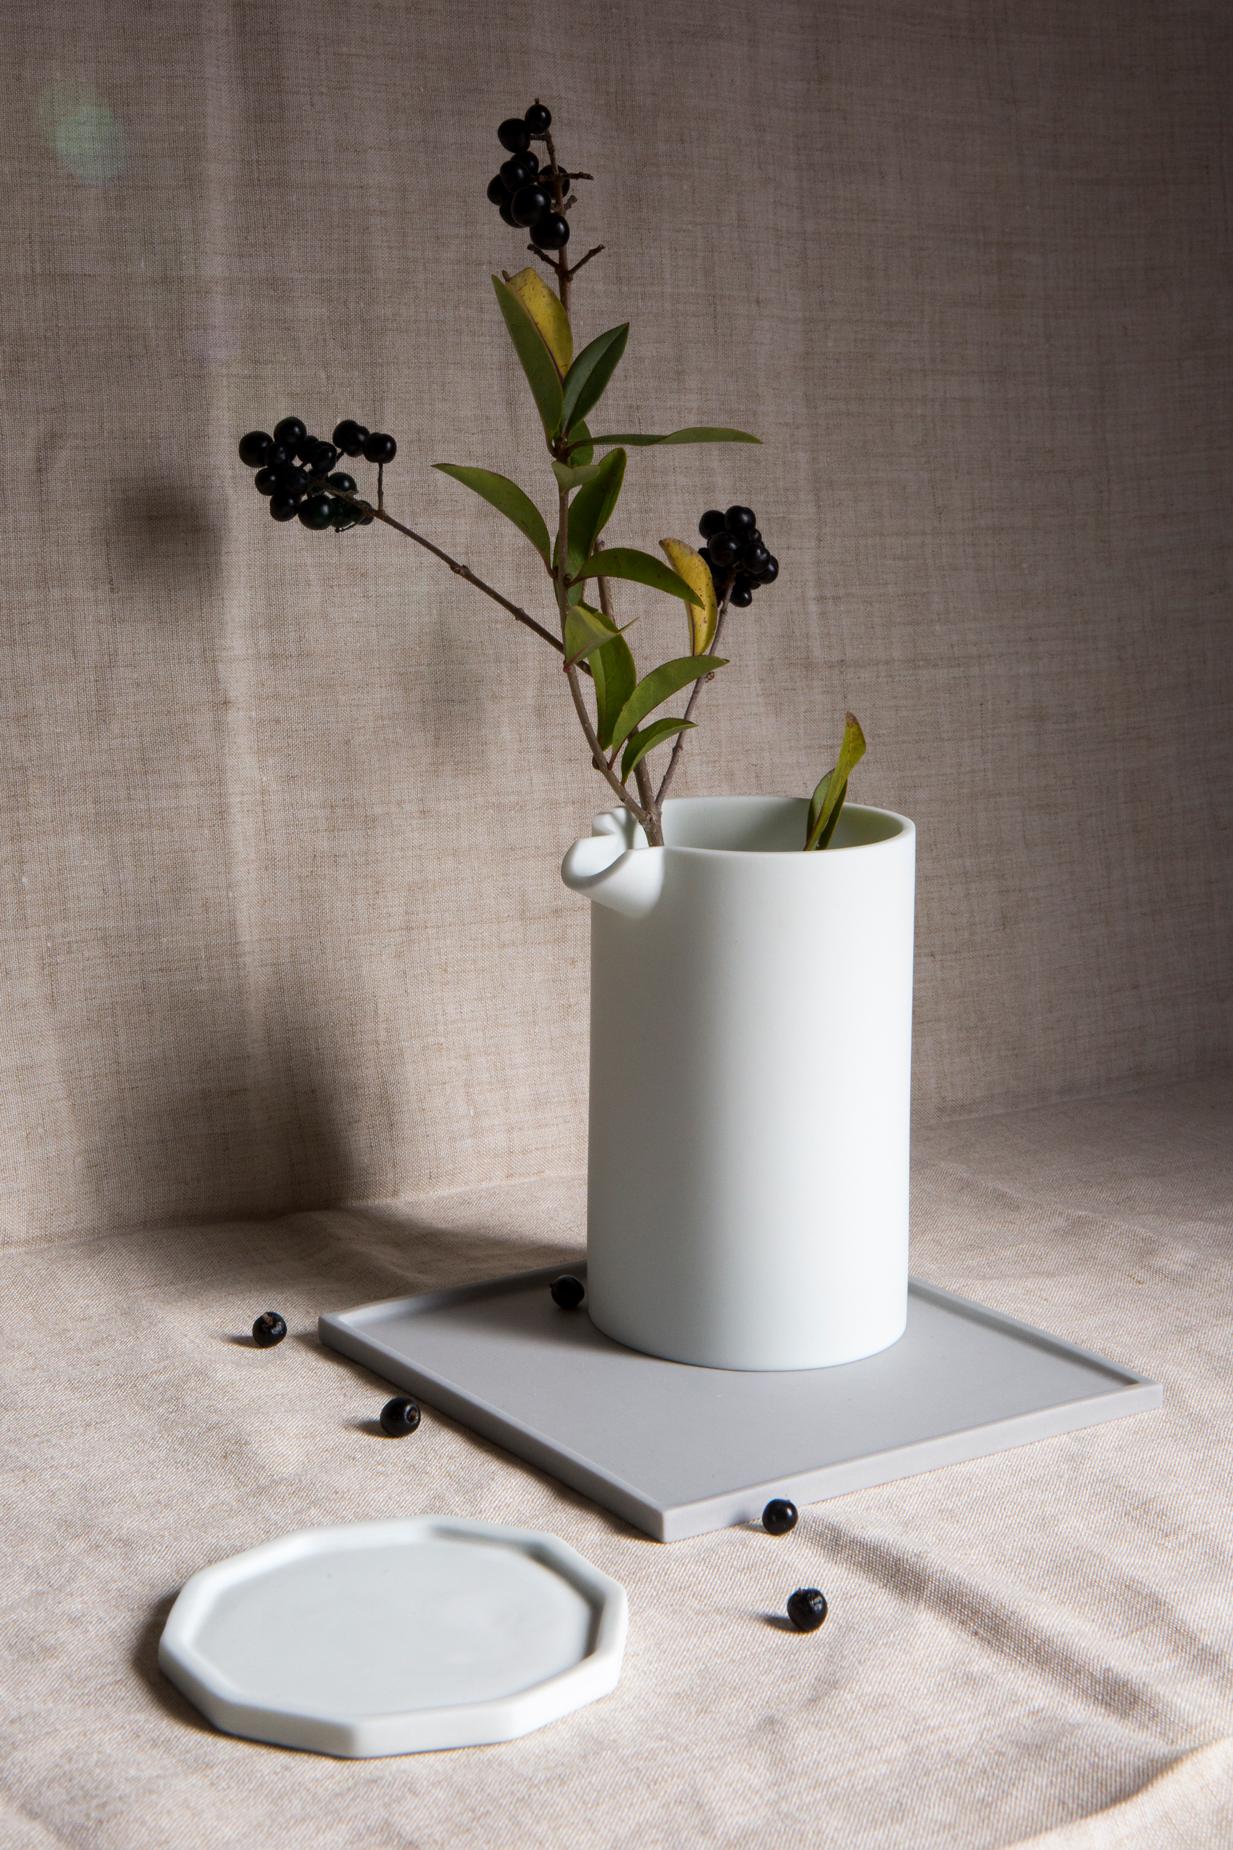 Natalie J Wood – Detsu parian clay pourer and plate